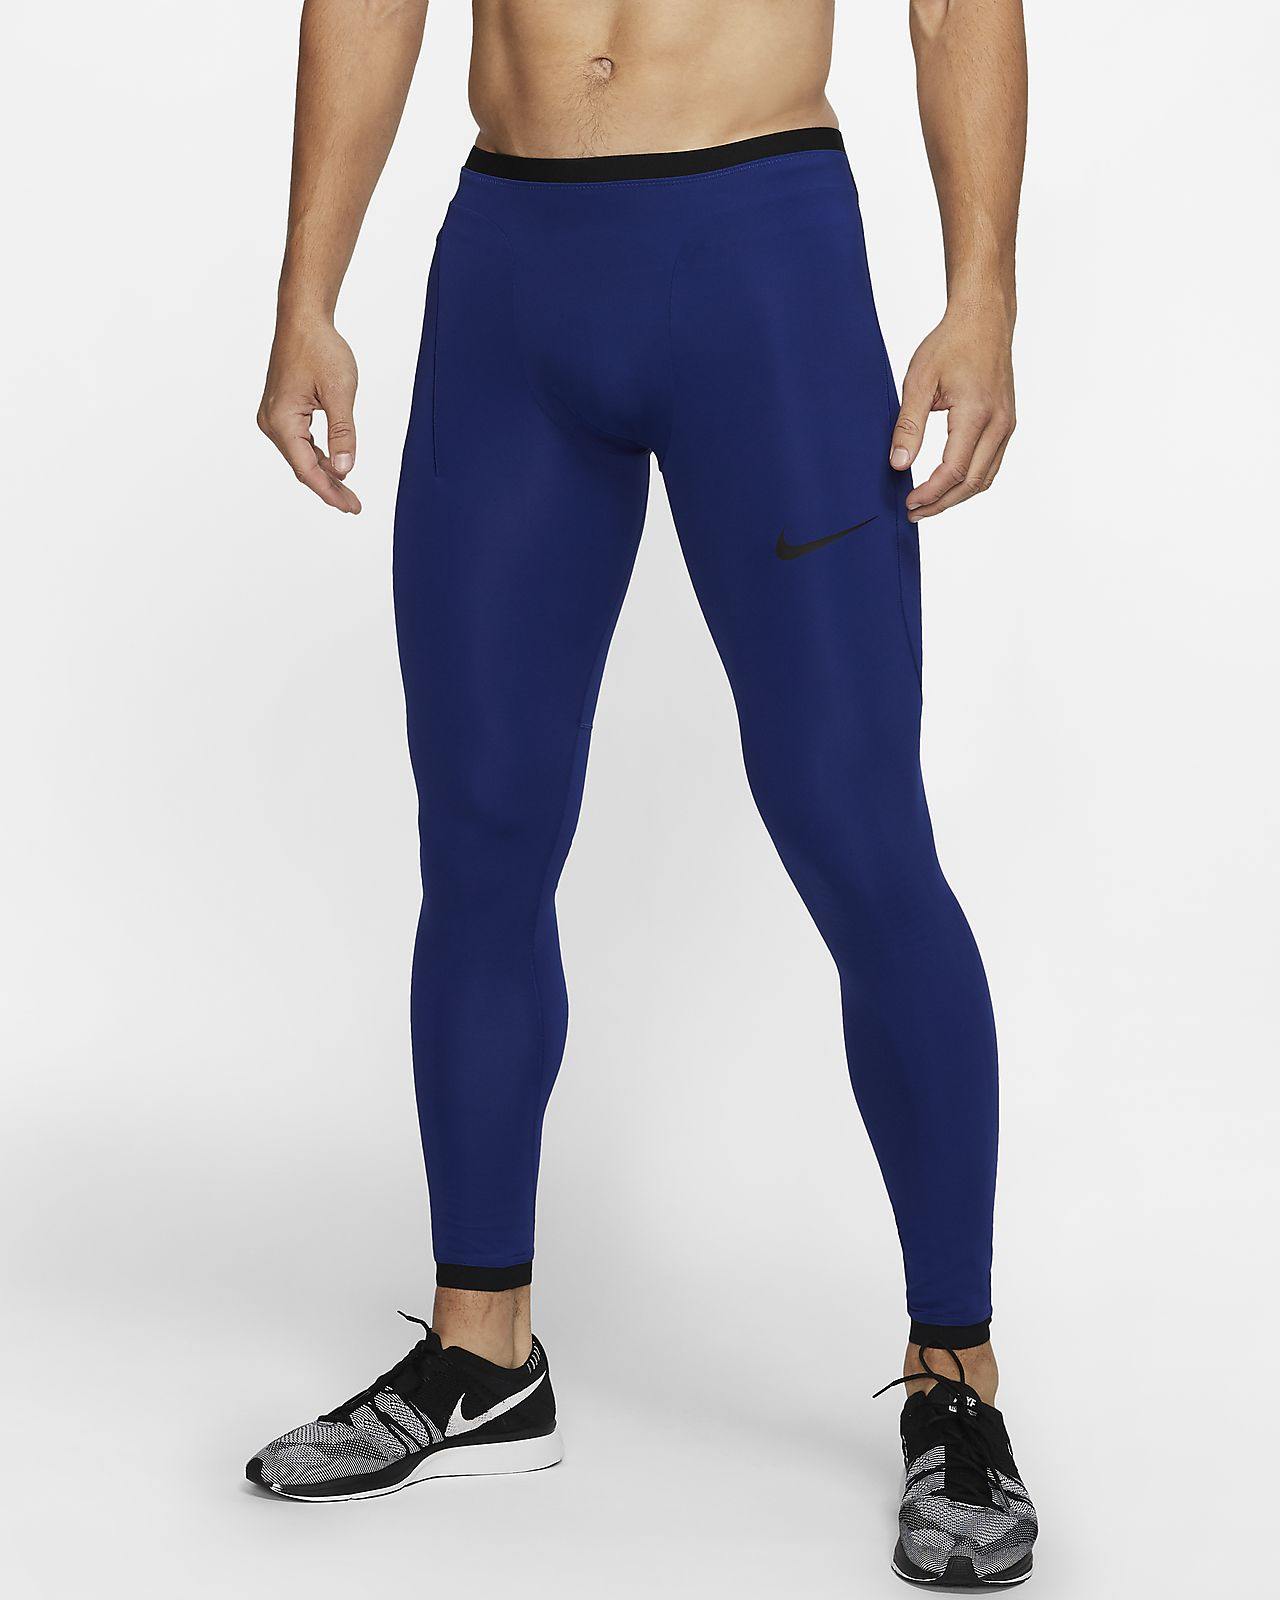 Tights Nike Pro Uomo